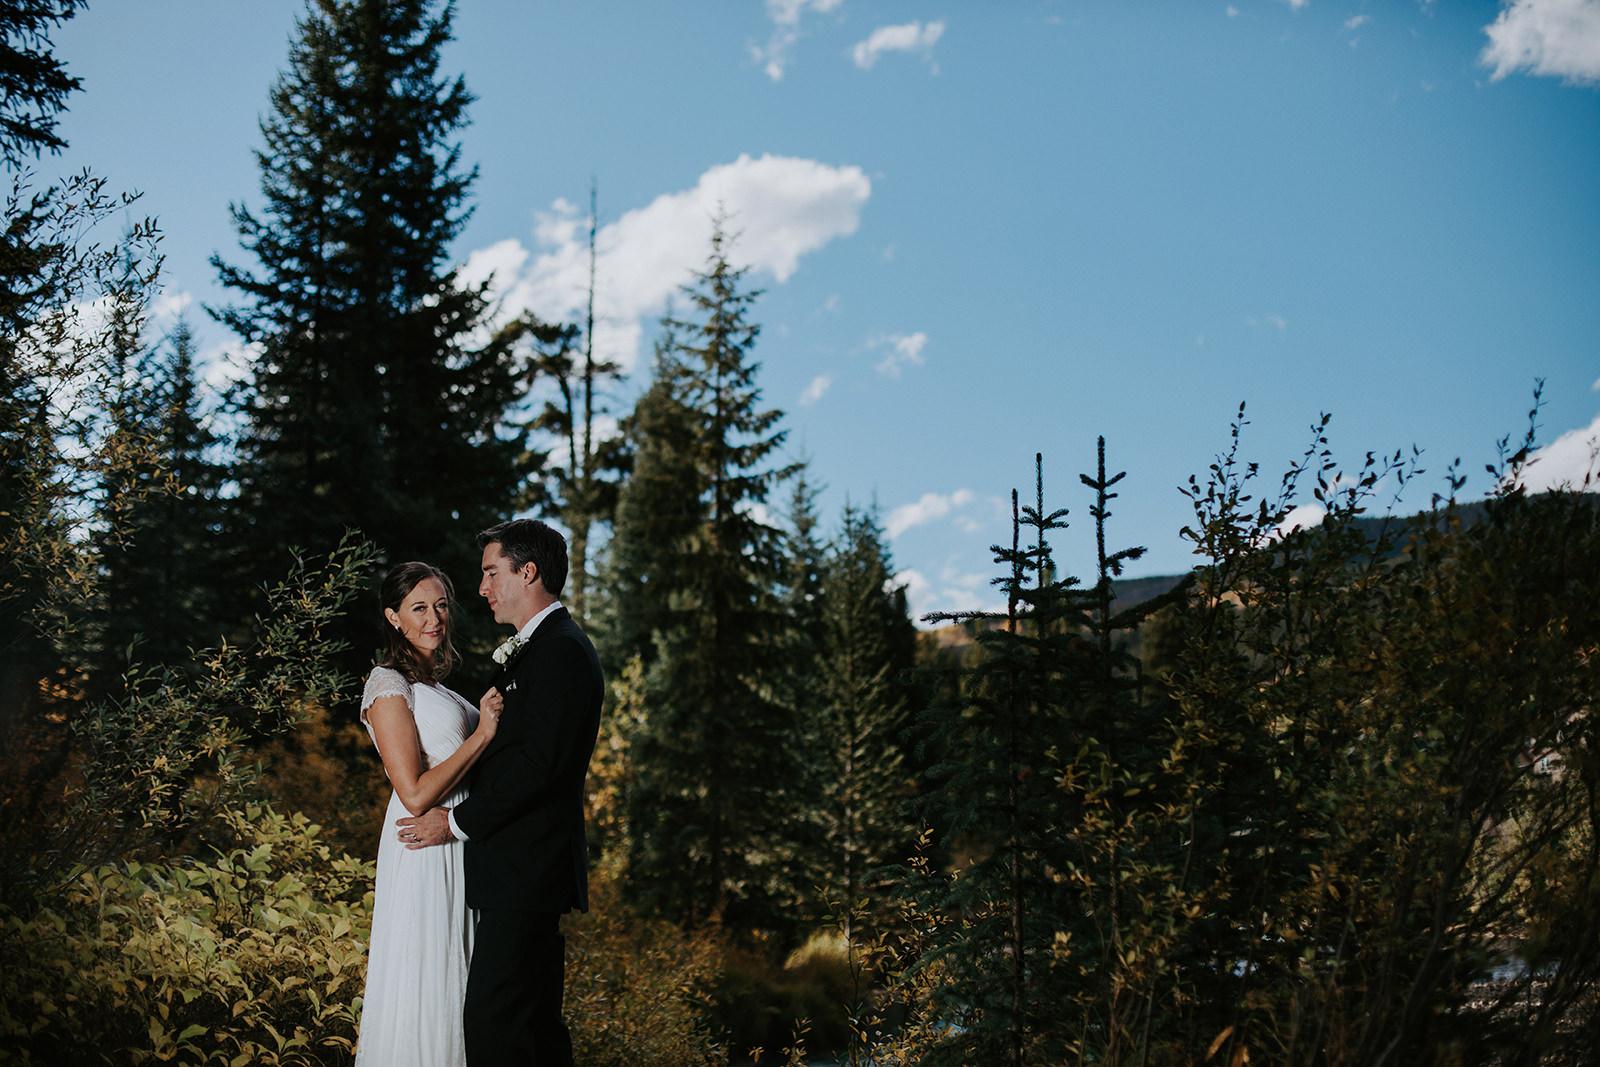 Quaking Aspen Amphitheater wedding fall colors Keystone Colorado river